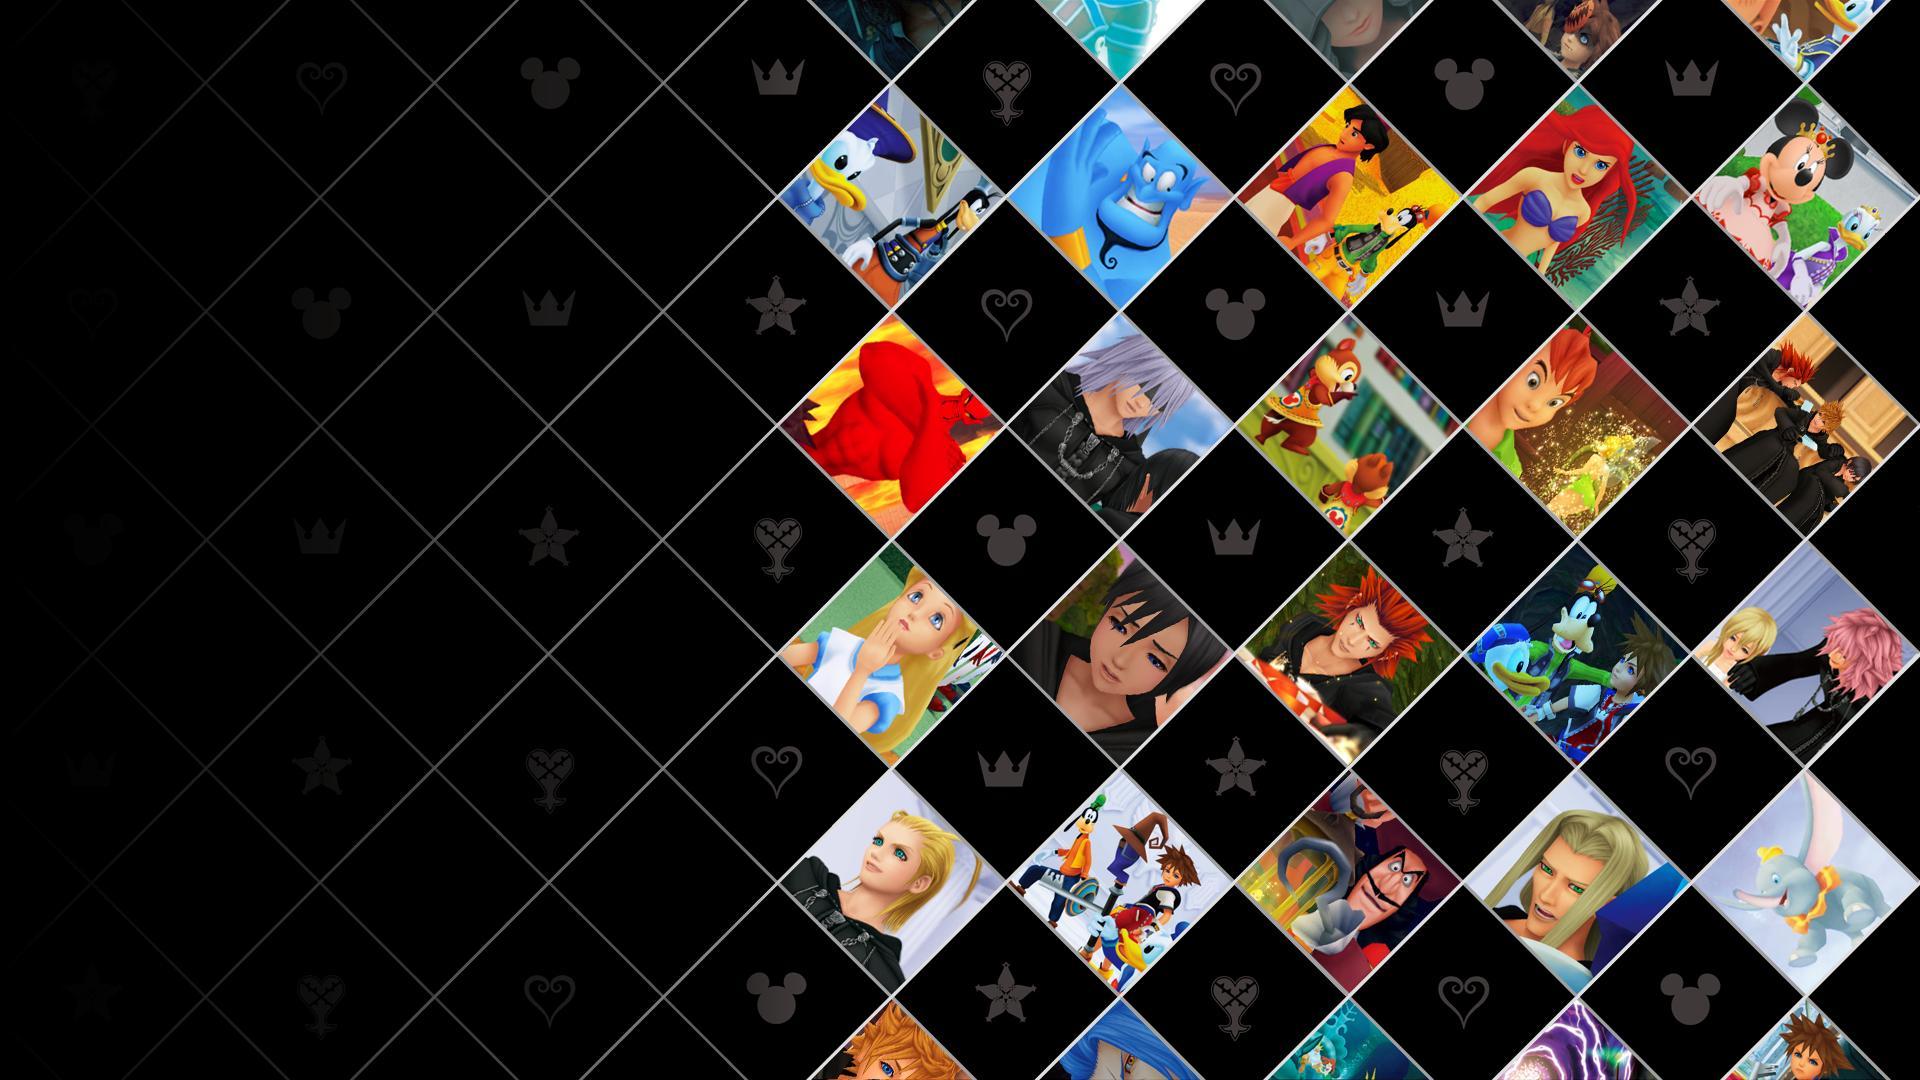 Kingdom Hearts 15 Ps3 Theme wallpaper   928409 1920x1080